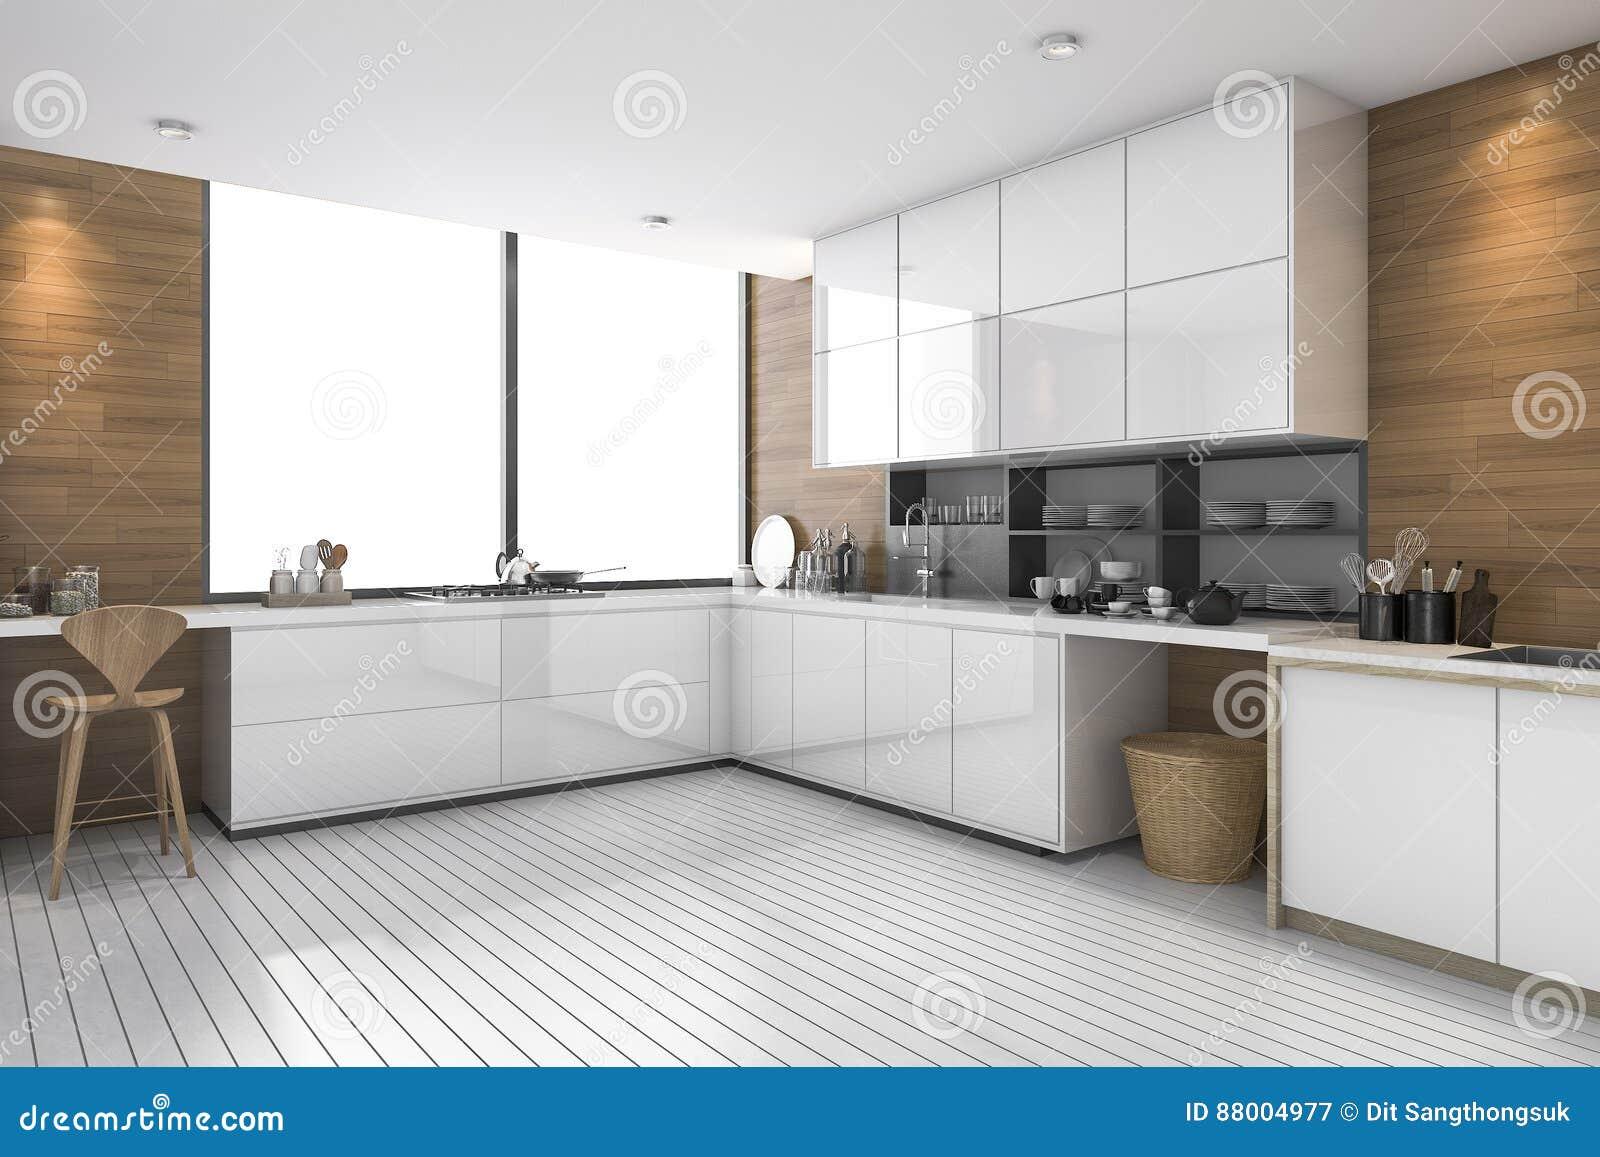 3d Che Rende Cucina Etnica Moderna Bianca Con Progettazione Di Legno ...